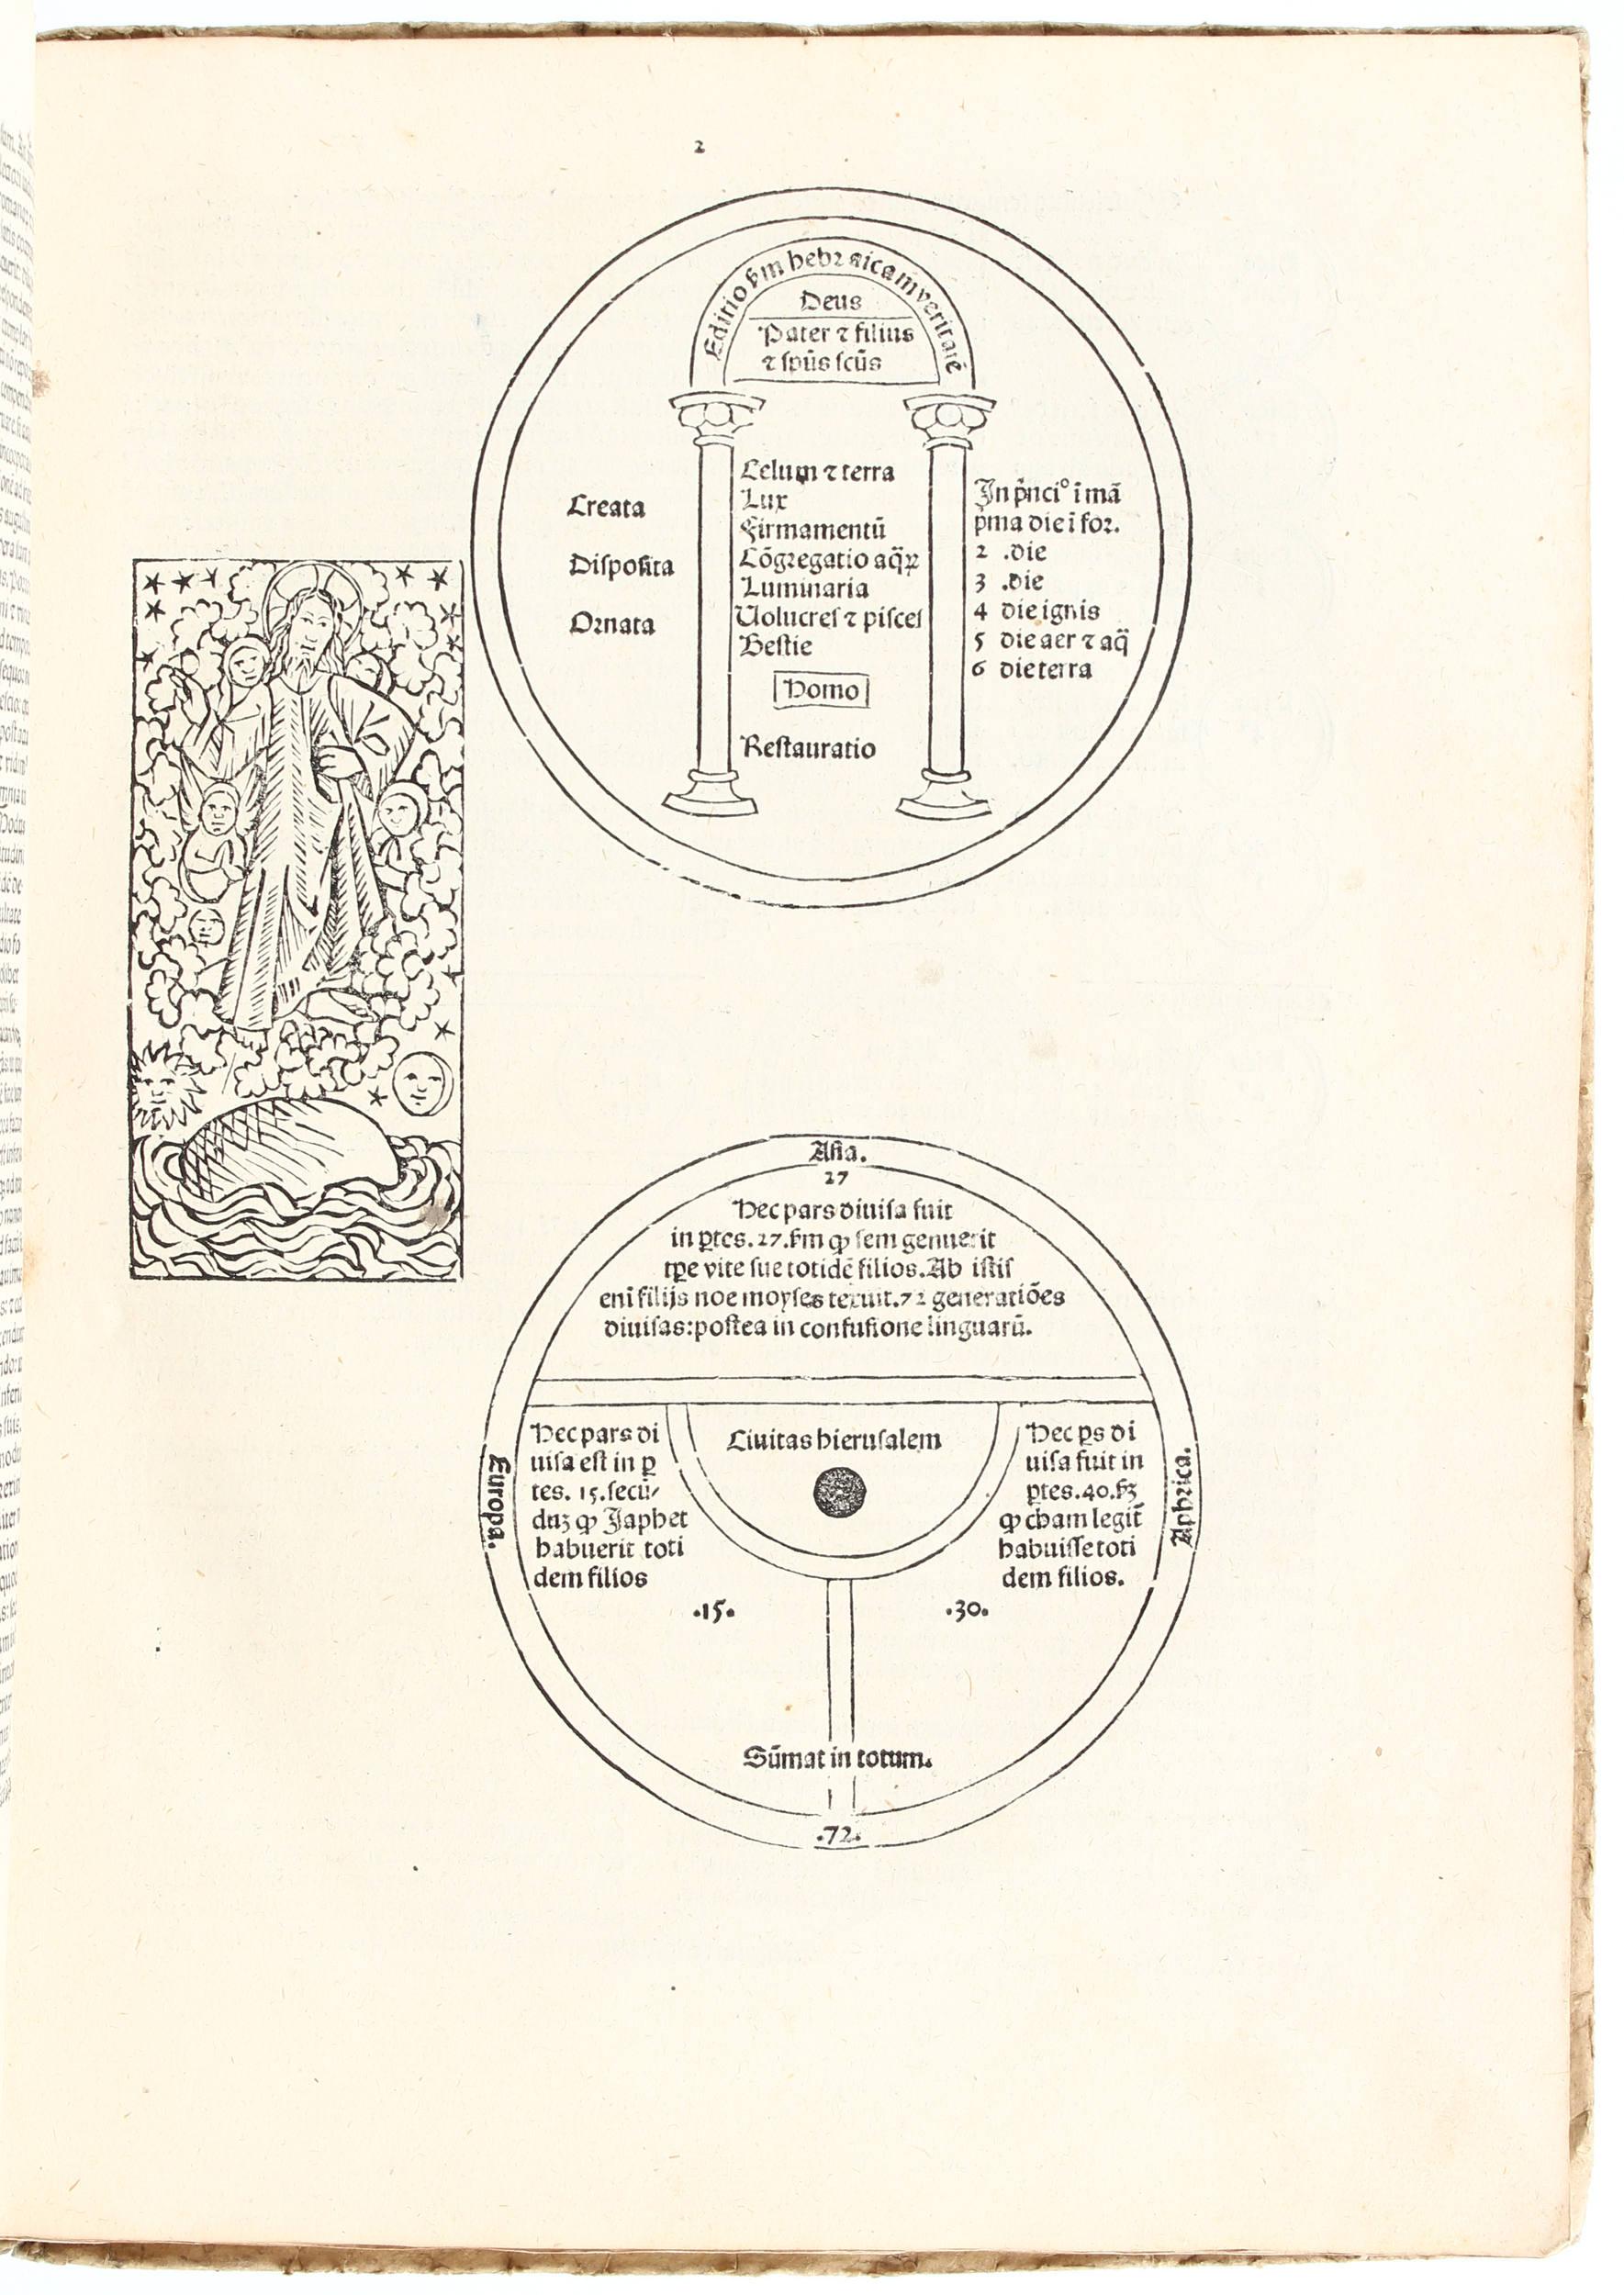 Fasciculus_ temporum_omnes_antiquorum_chronicas Rolevinck_Werner 1484 ed Erhard Ratdolt (Venetiis) p 2